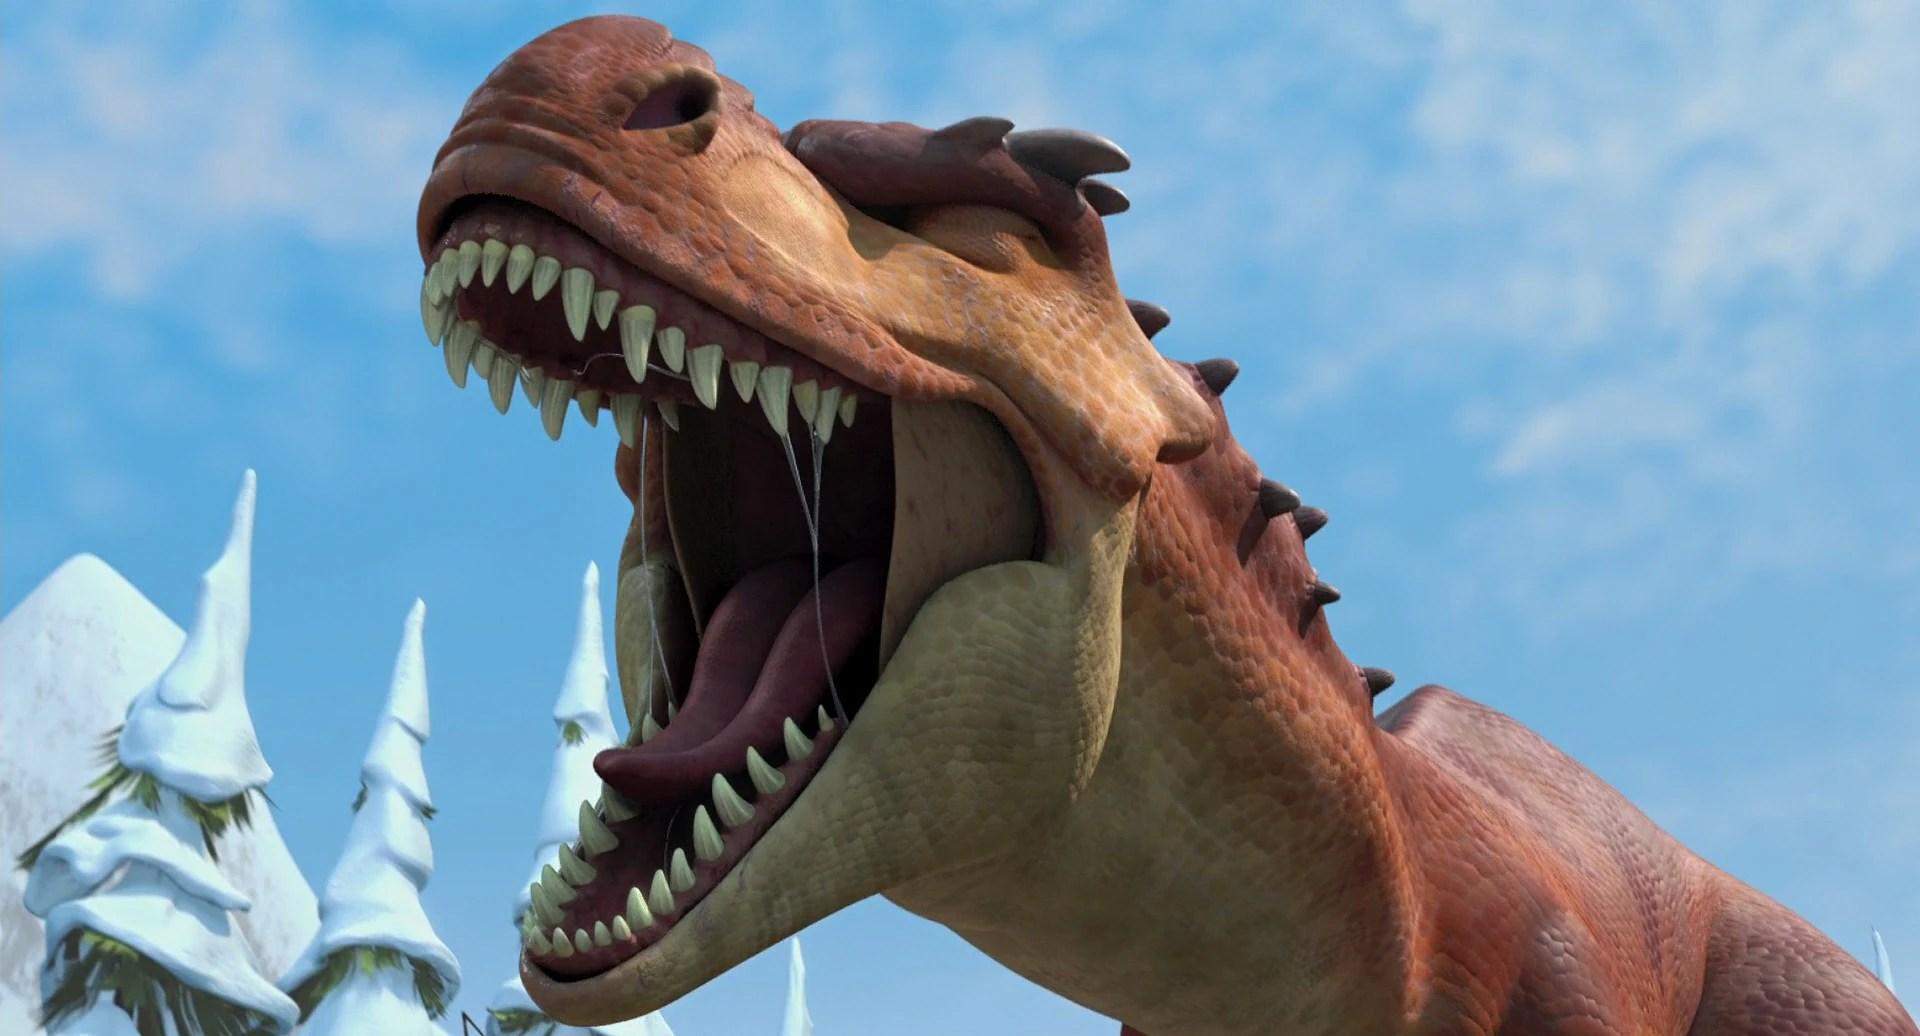 Dinosaur 3d Live Wallpaper Momma Dino Gallery Ice Age Wiki Fandom Powered By Wikia